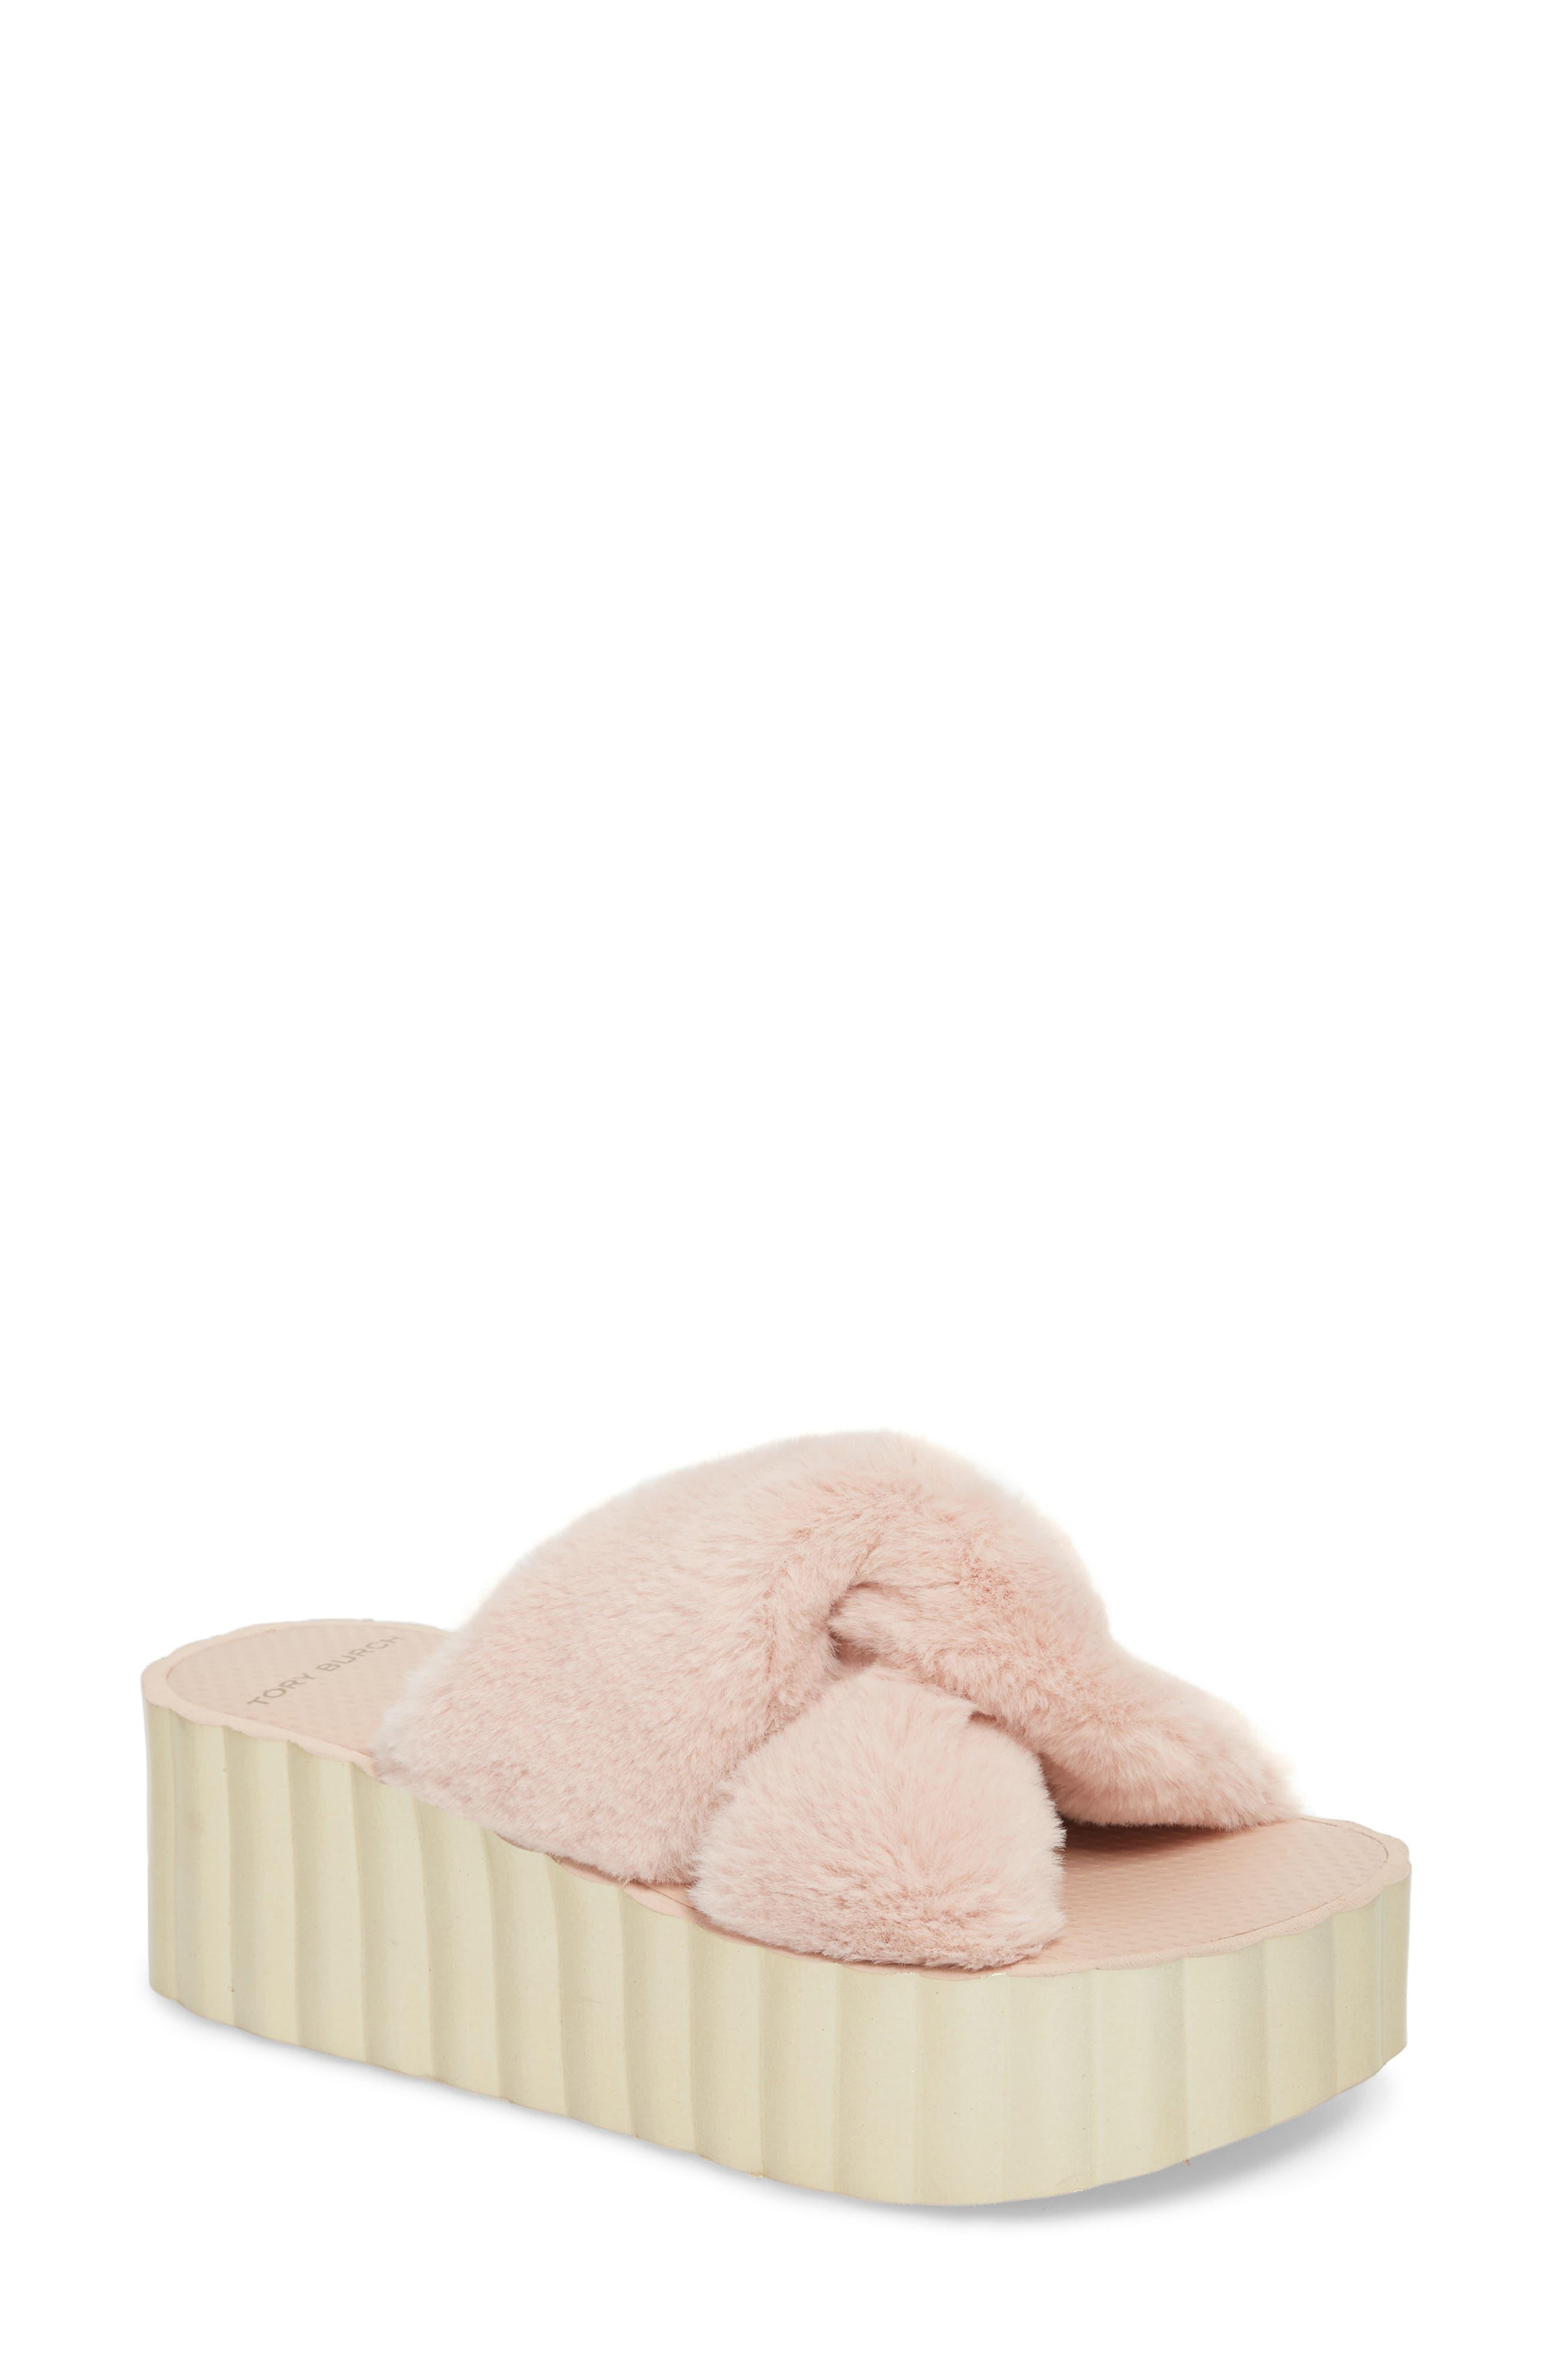 Faux Fur Scallop Platform Slide Sandal,                         Main,                         color, Sea Shell Pink